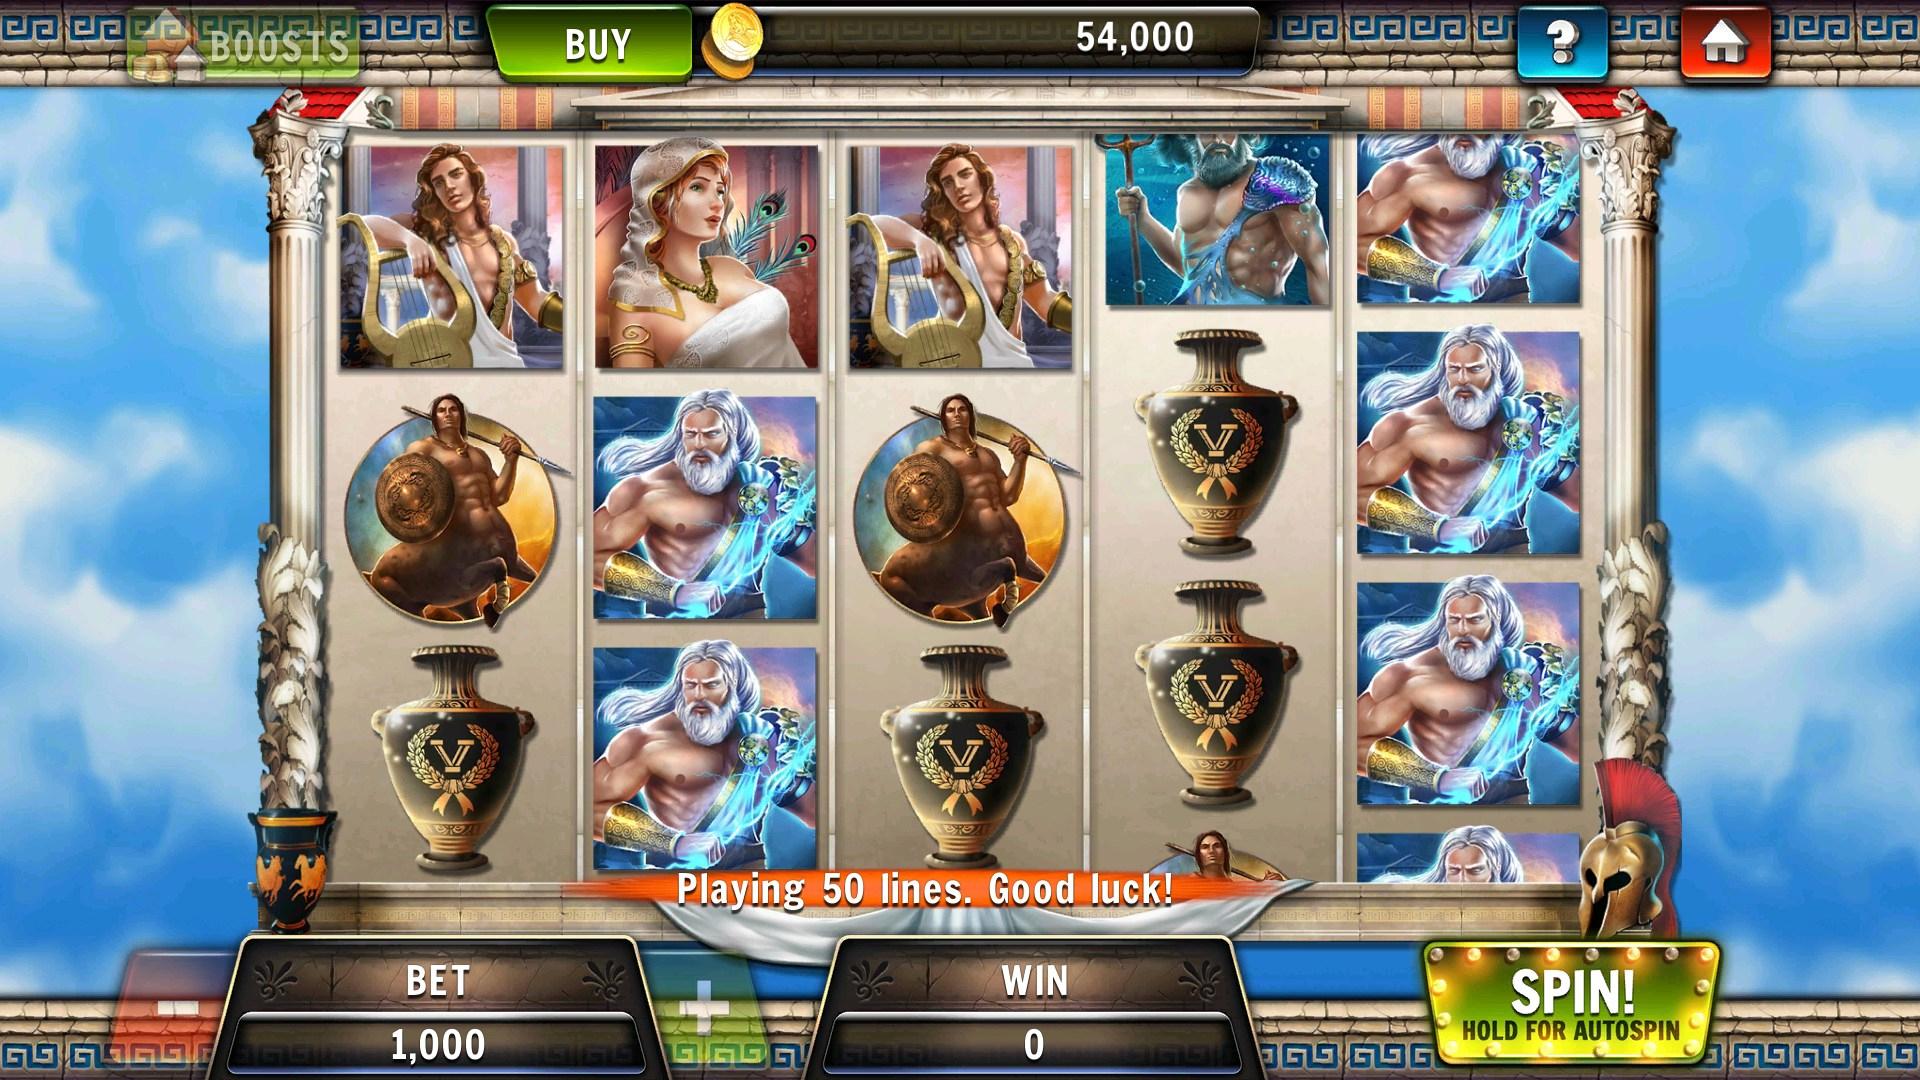 Bgo casino 20 free spins